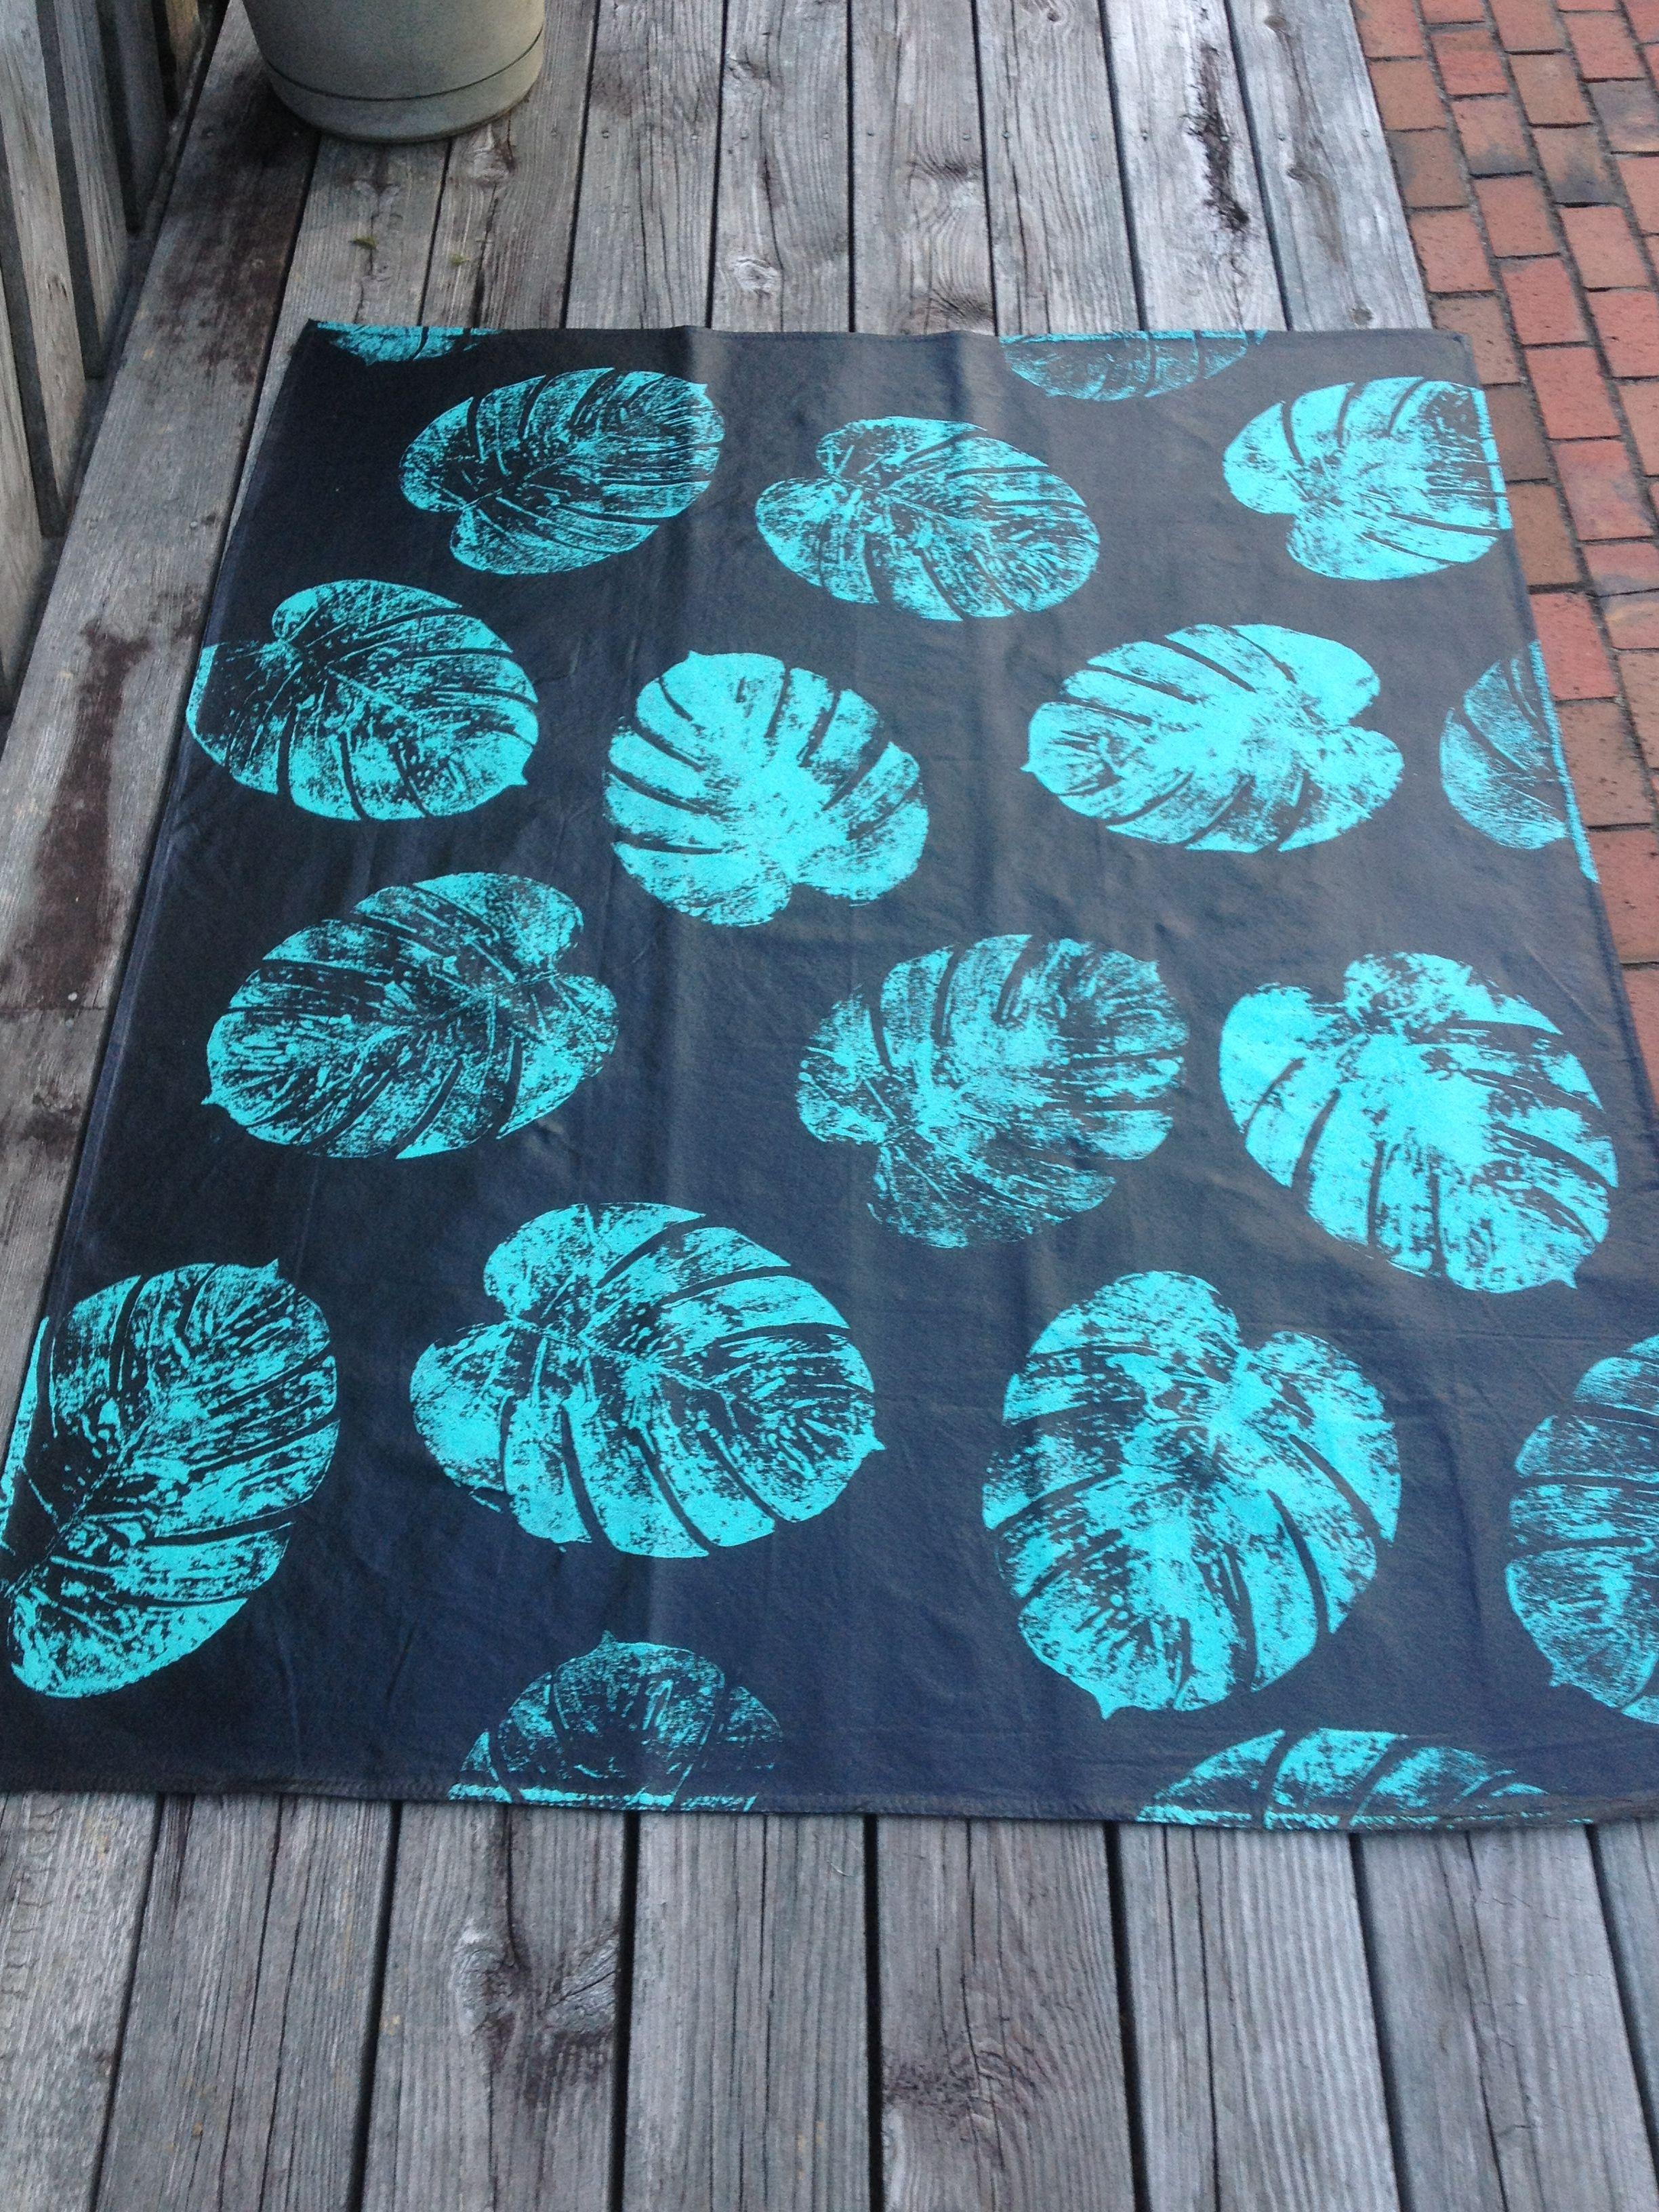 Painted Canvas Drop Cloth Rug Project Ideas Drop